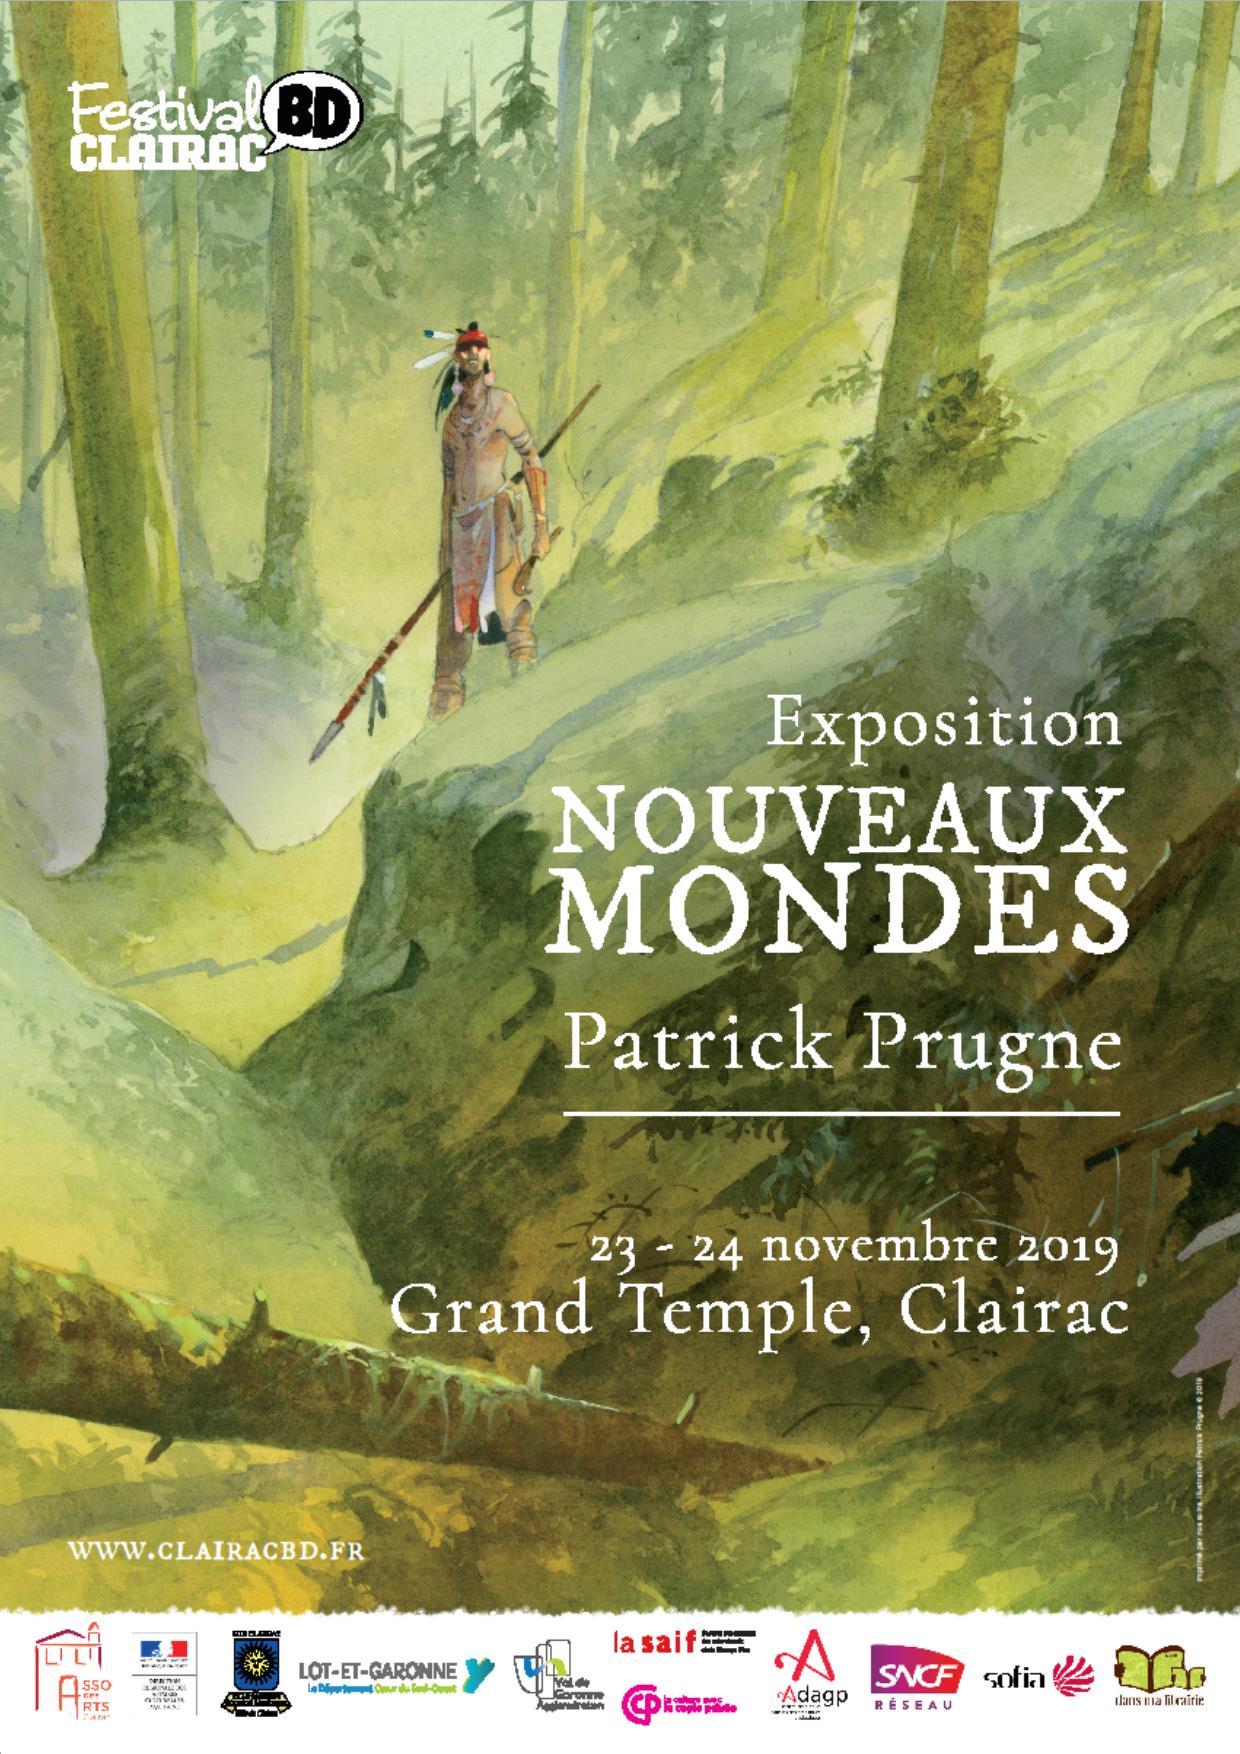 Expo Patrick Prugne au Temple